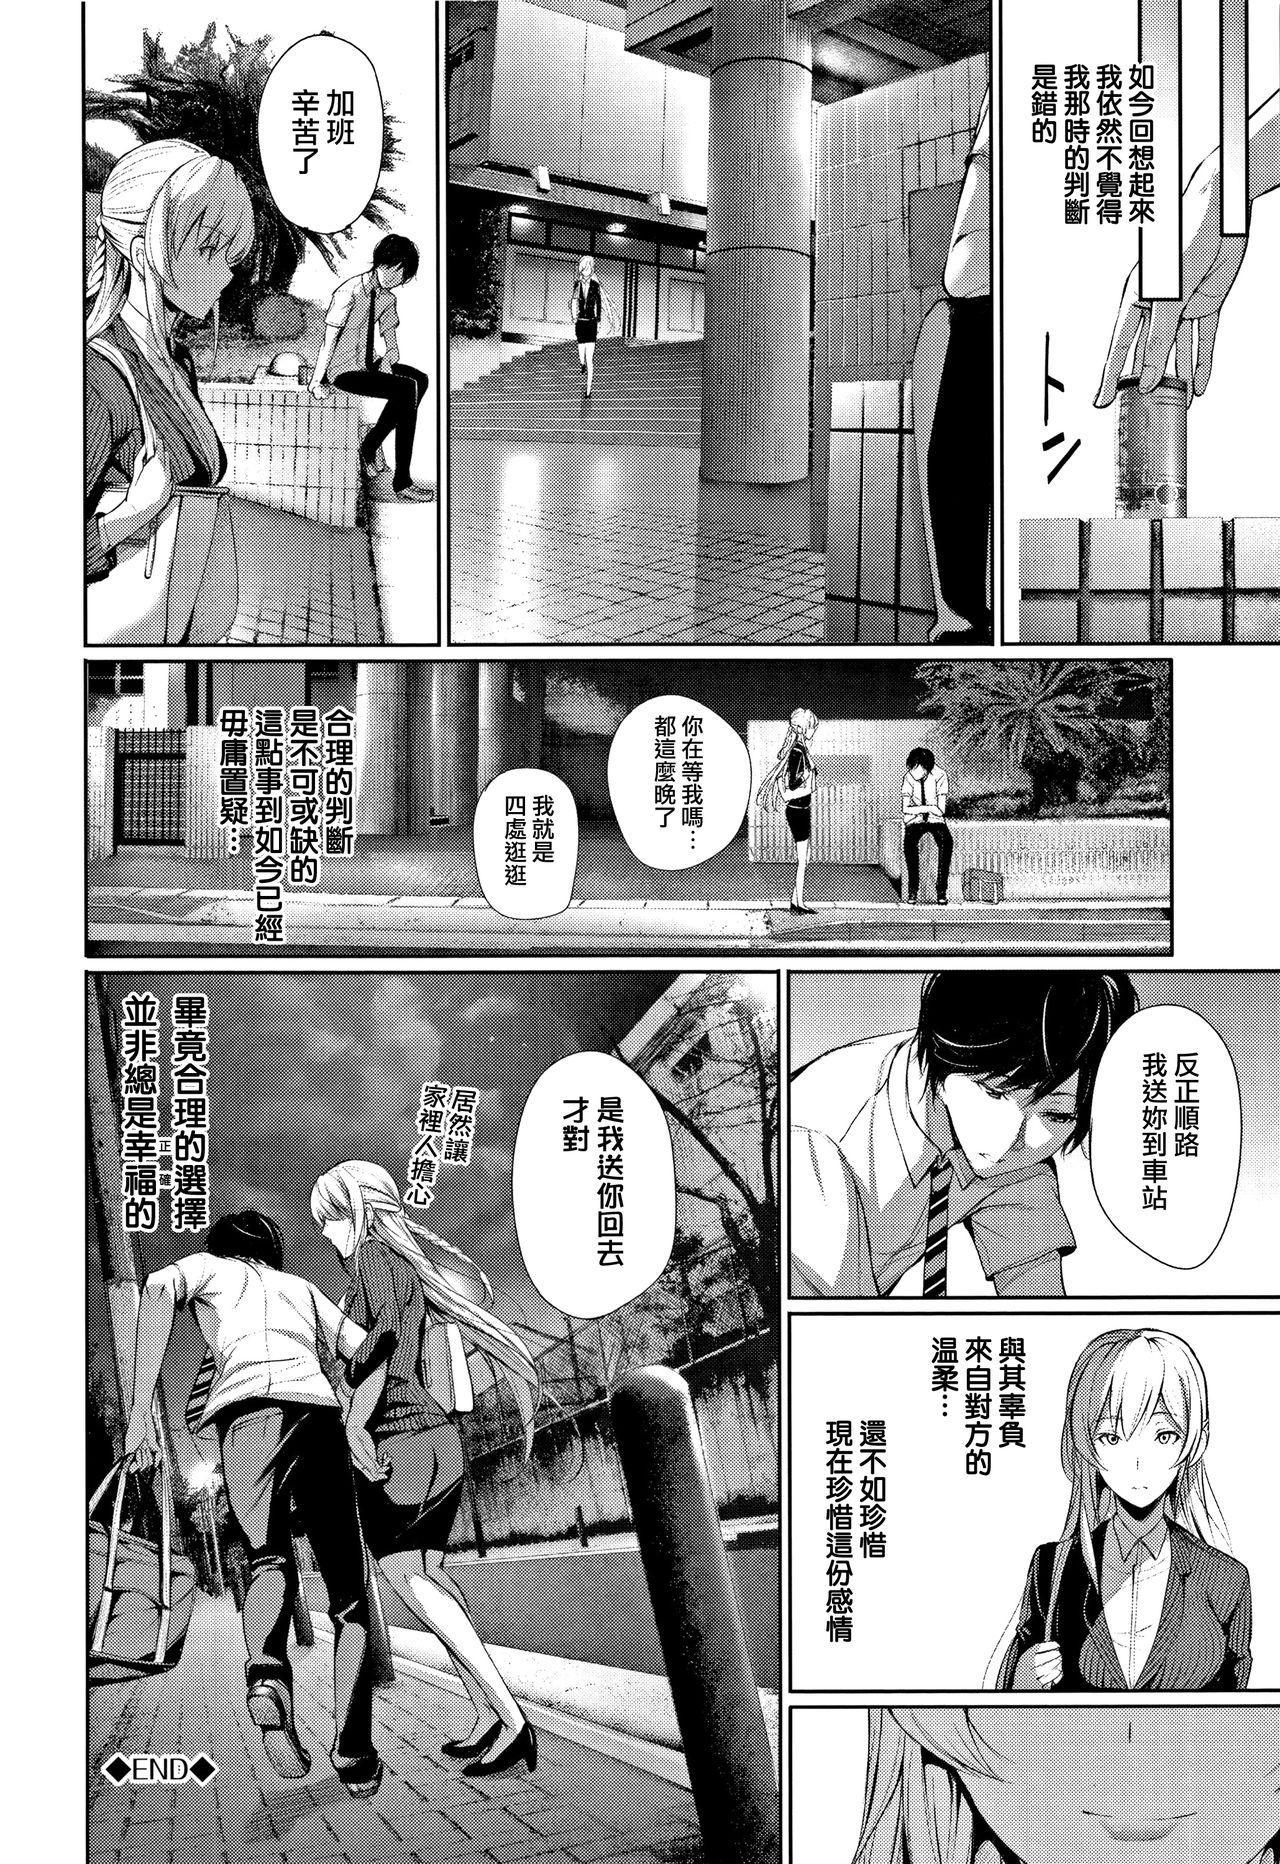 [Gentsuki] Kimi Omou Koi - I think of you. Ch. 1-7 [Chinese] [无毒汉化组] 148